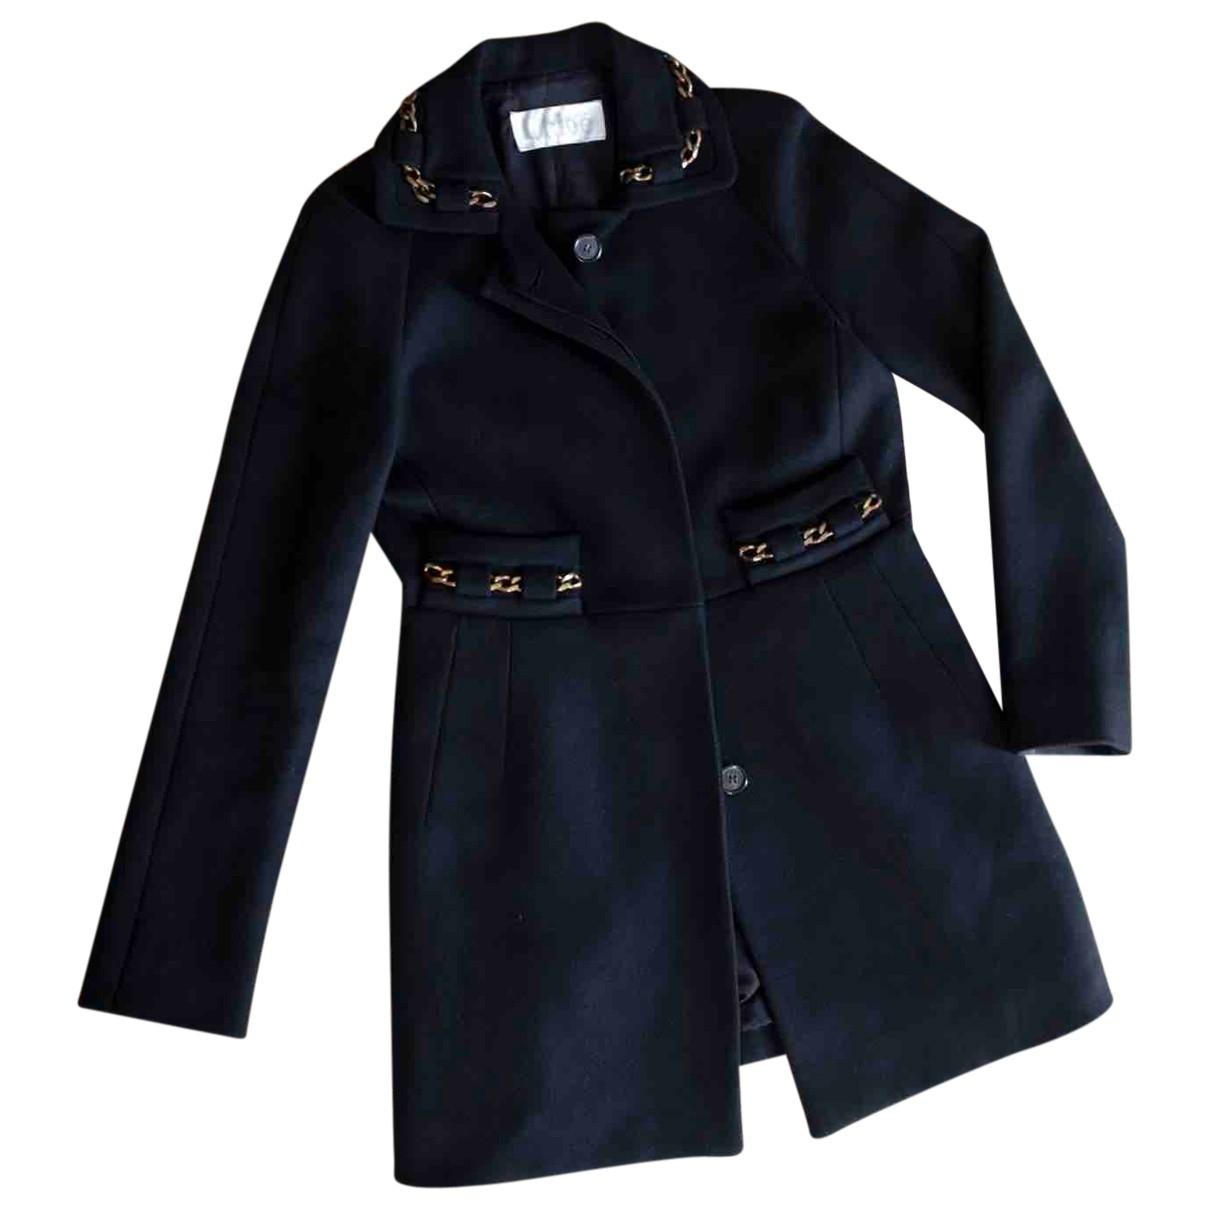 Chloé \N Black Wool coat for Women S International